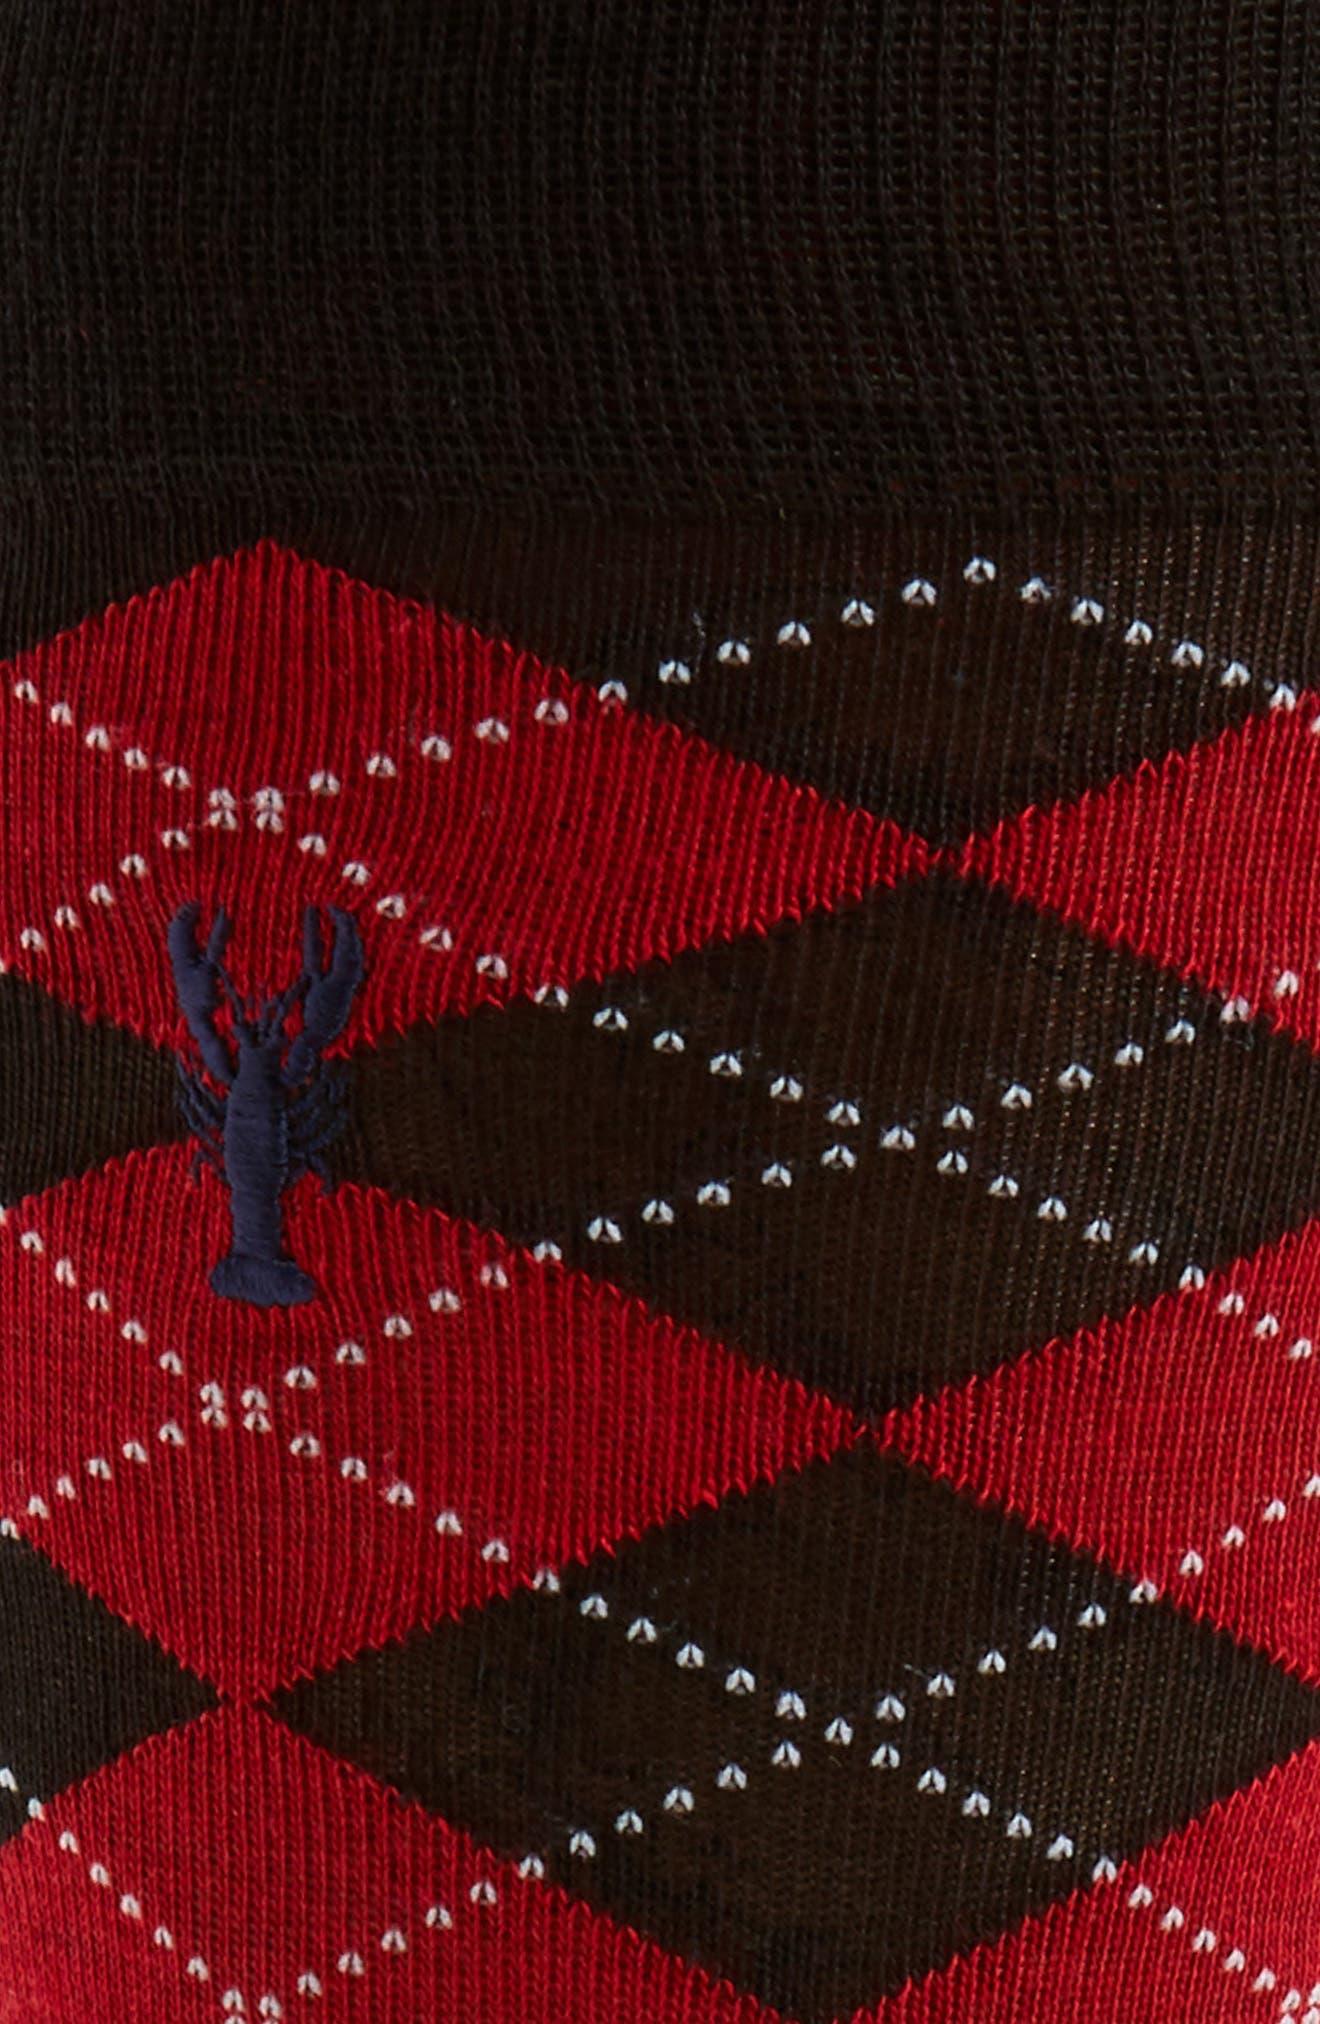 Pinch Argyle Socks,                             Alternate thumbnail 2, color,                             Black/ Red